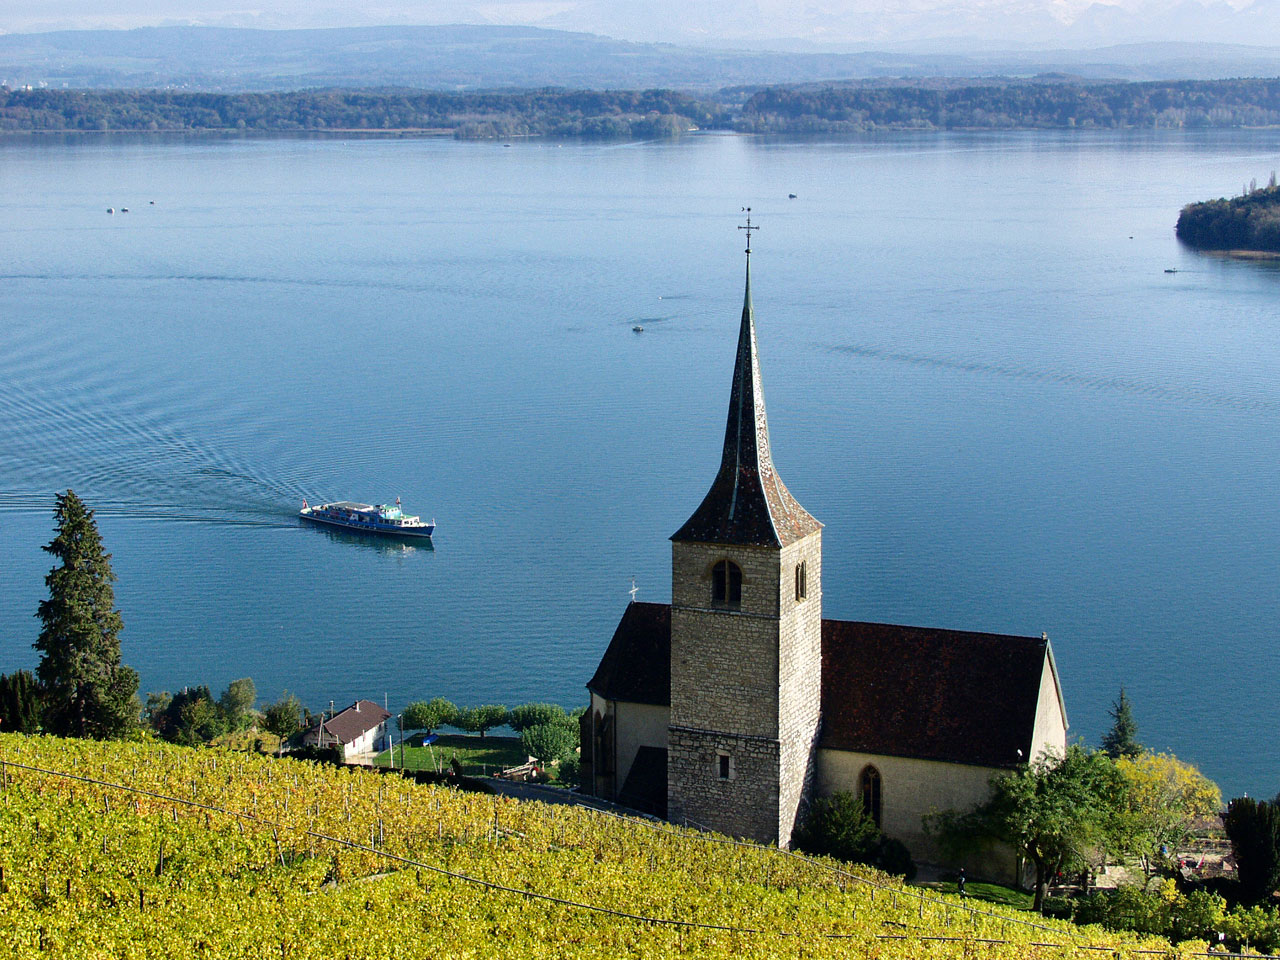 Lake of Biel, Switzerland.